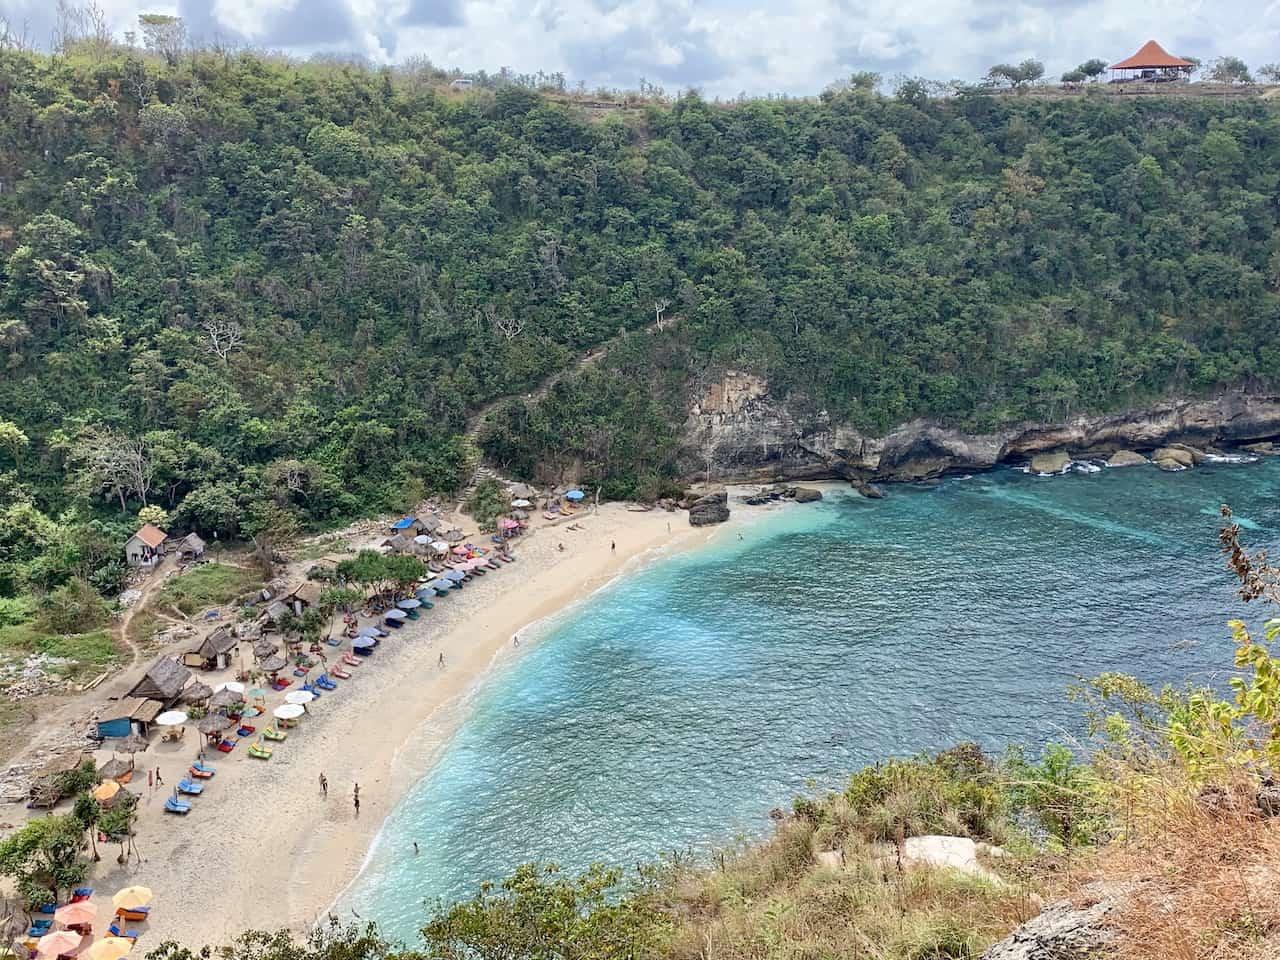 Atuh Beach of Nusa Penida